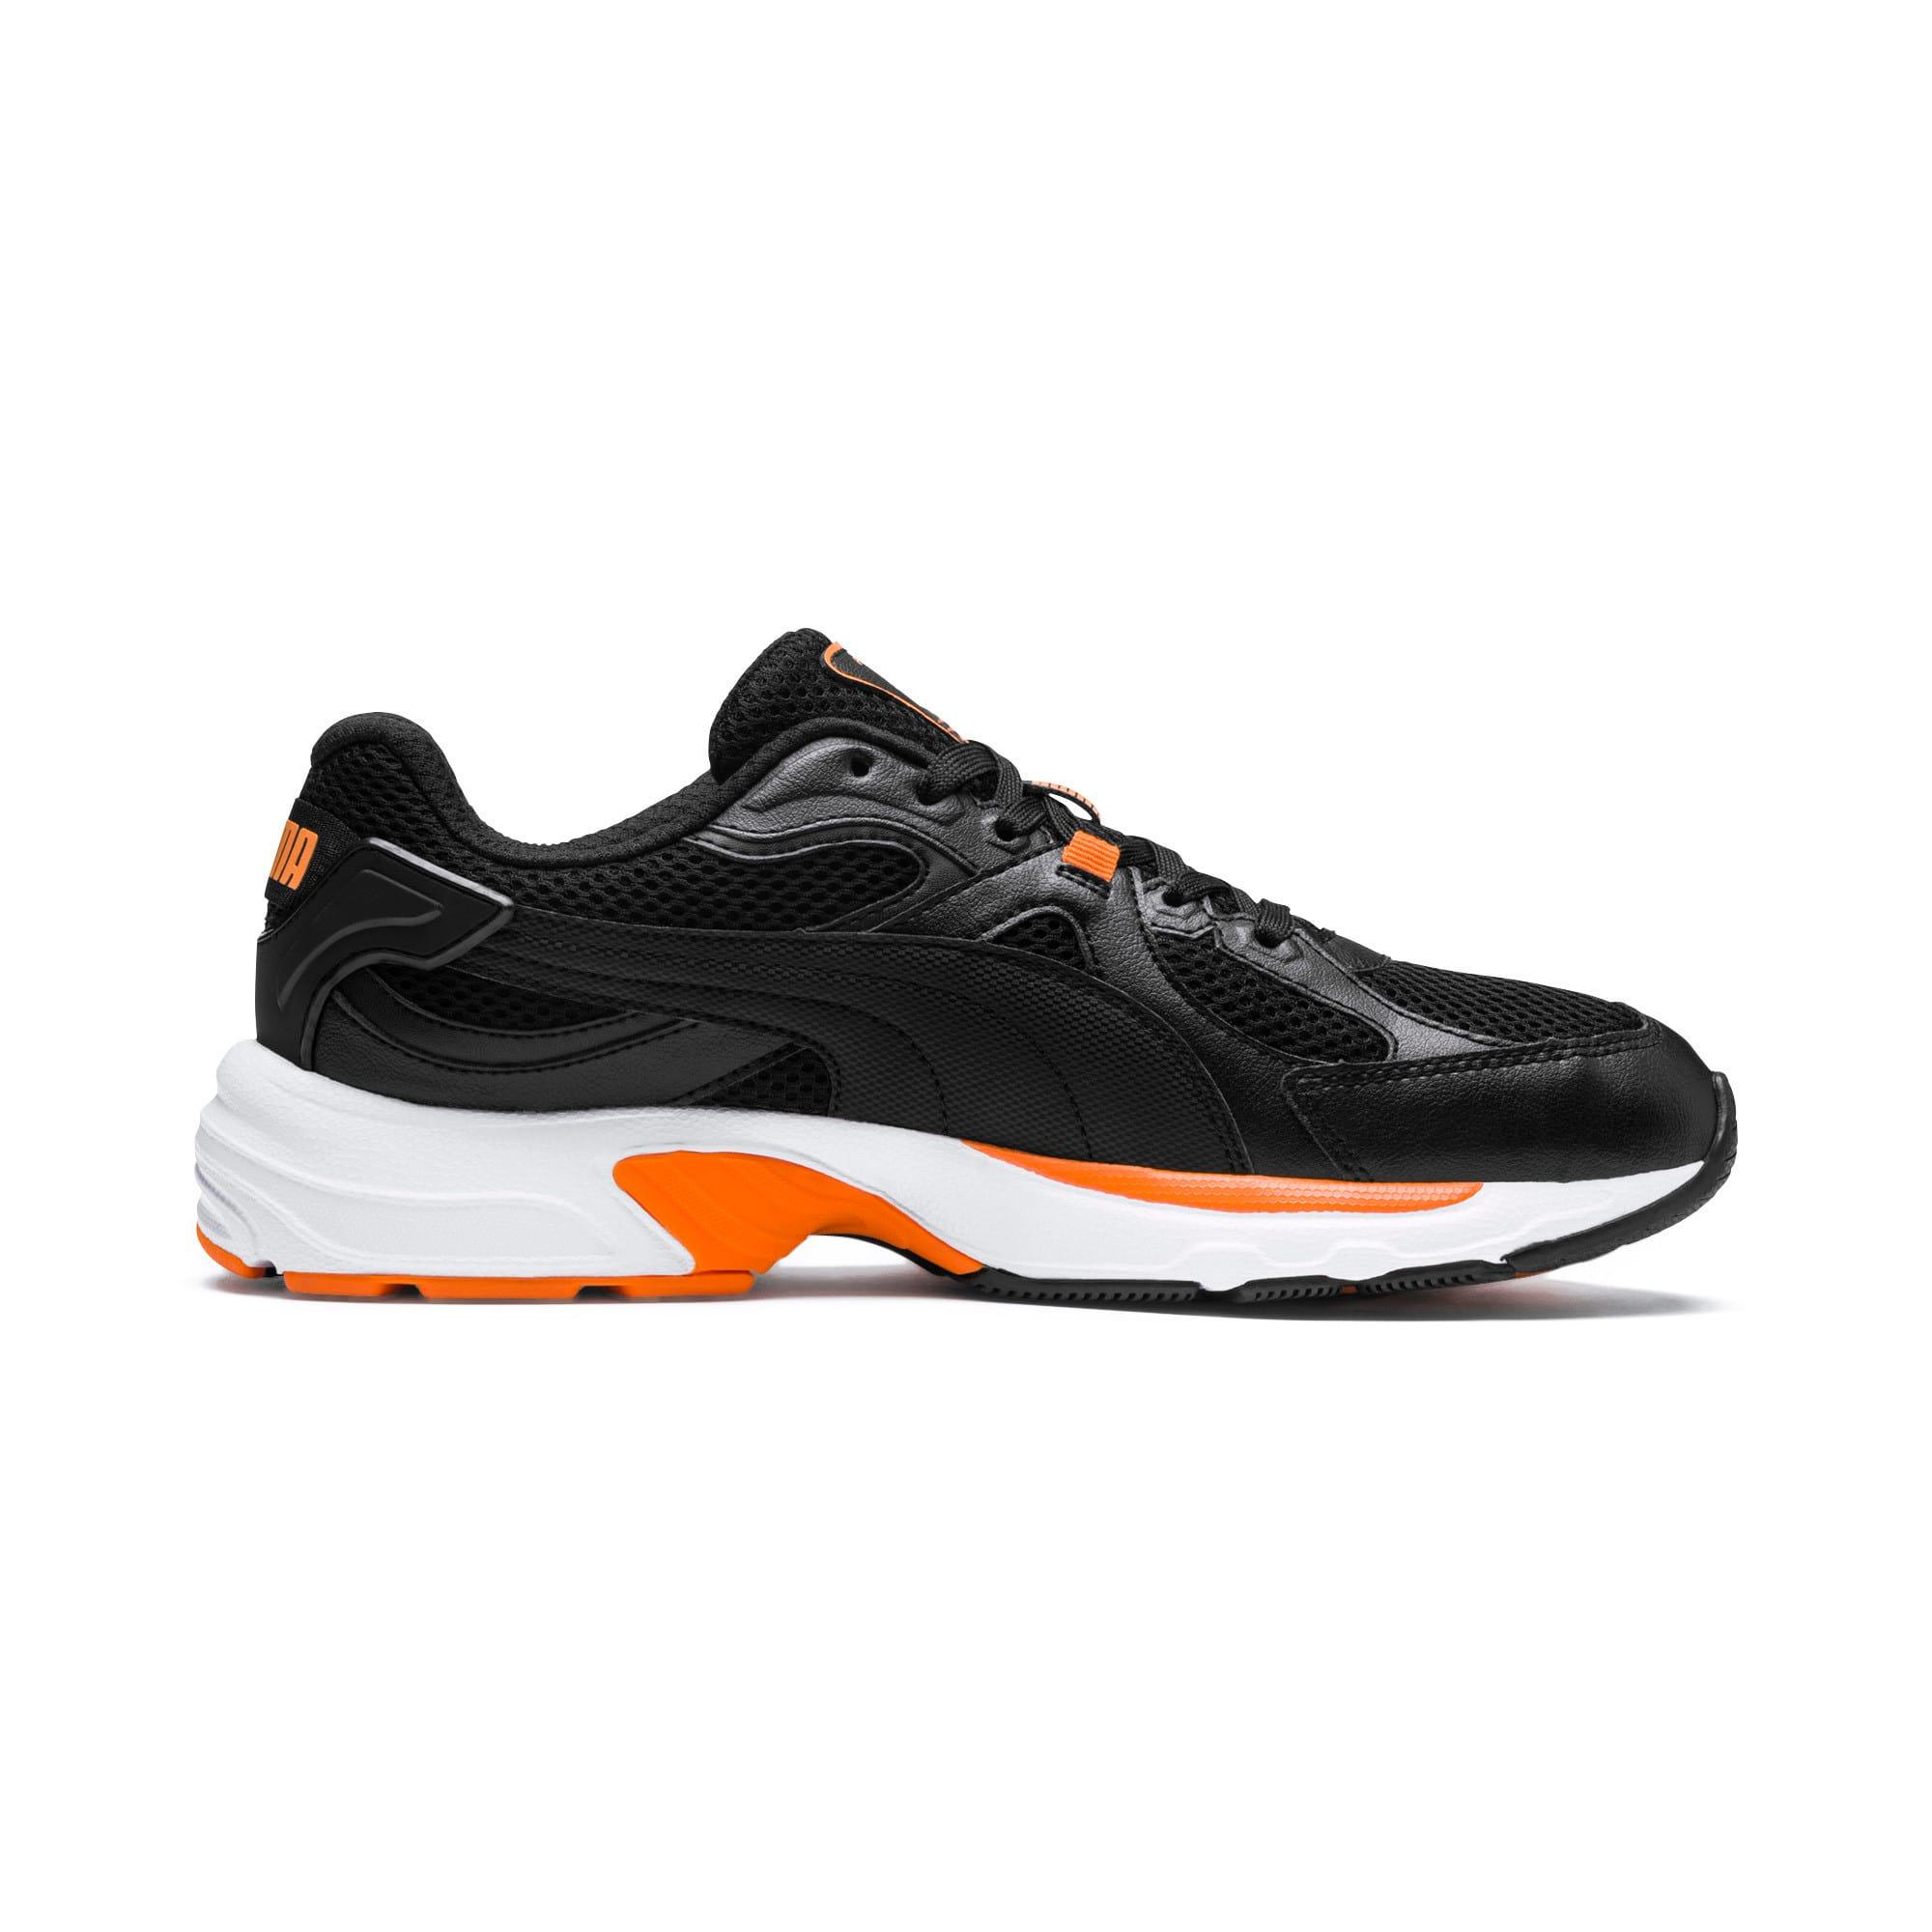 Thumbnail 5 of Axis Plus 90s Sneakers, Puma Black-Puma Black, medium